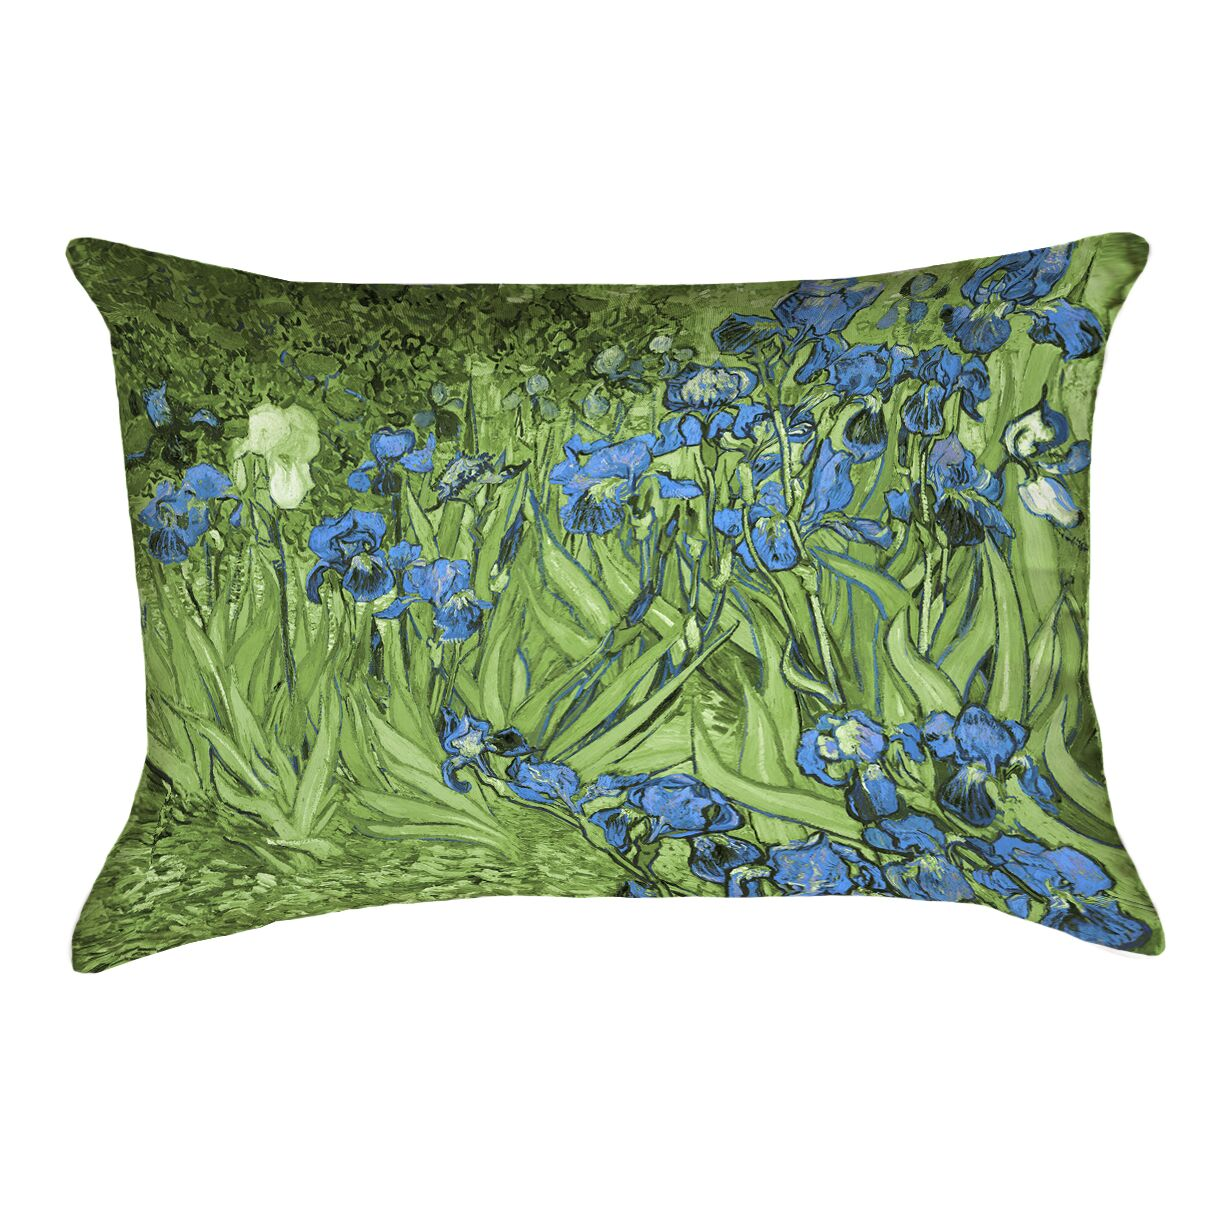 Morley Irises Lumbar Pillow Color: Green/Blue